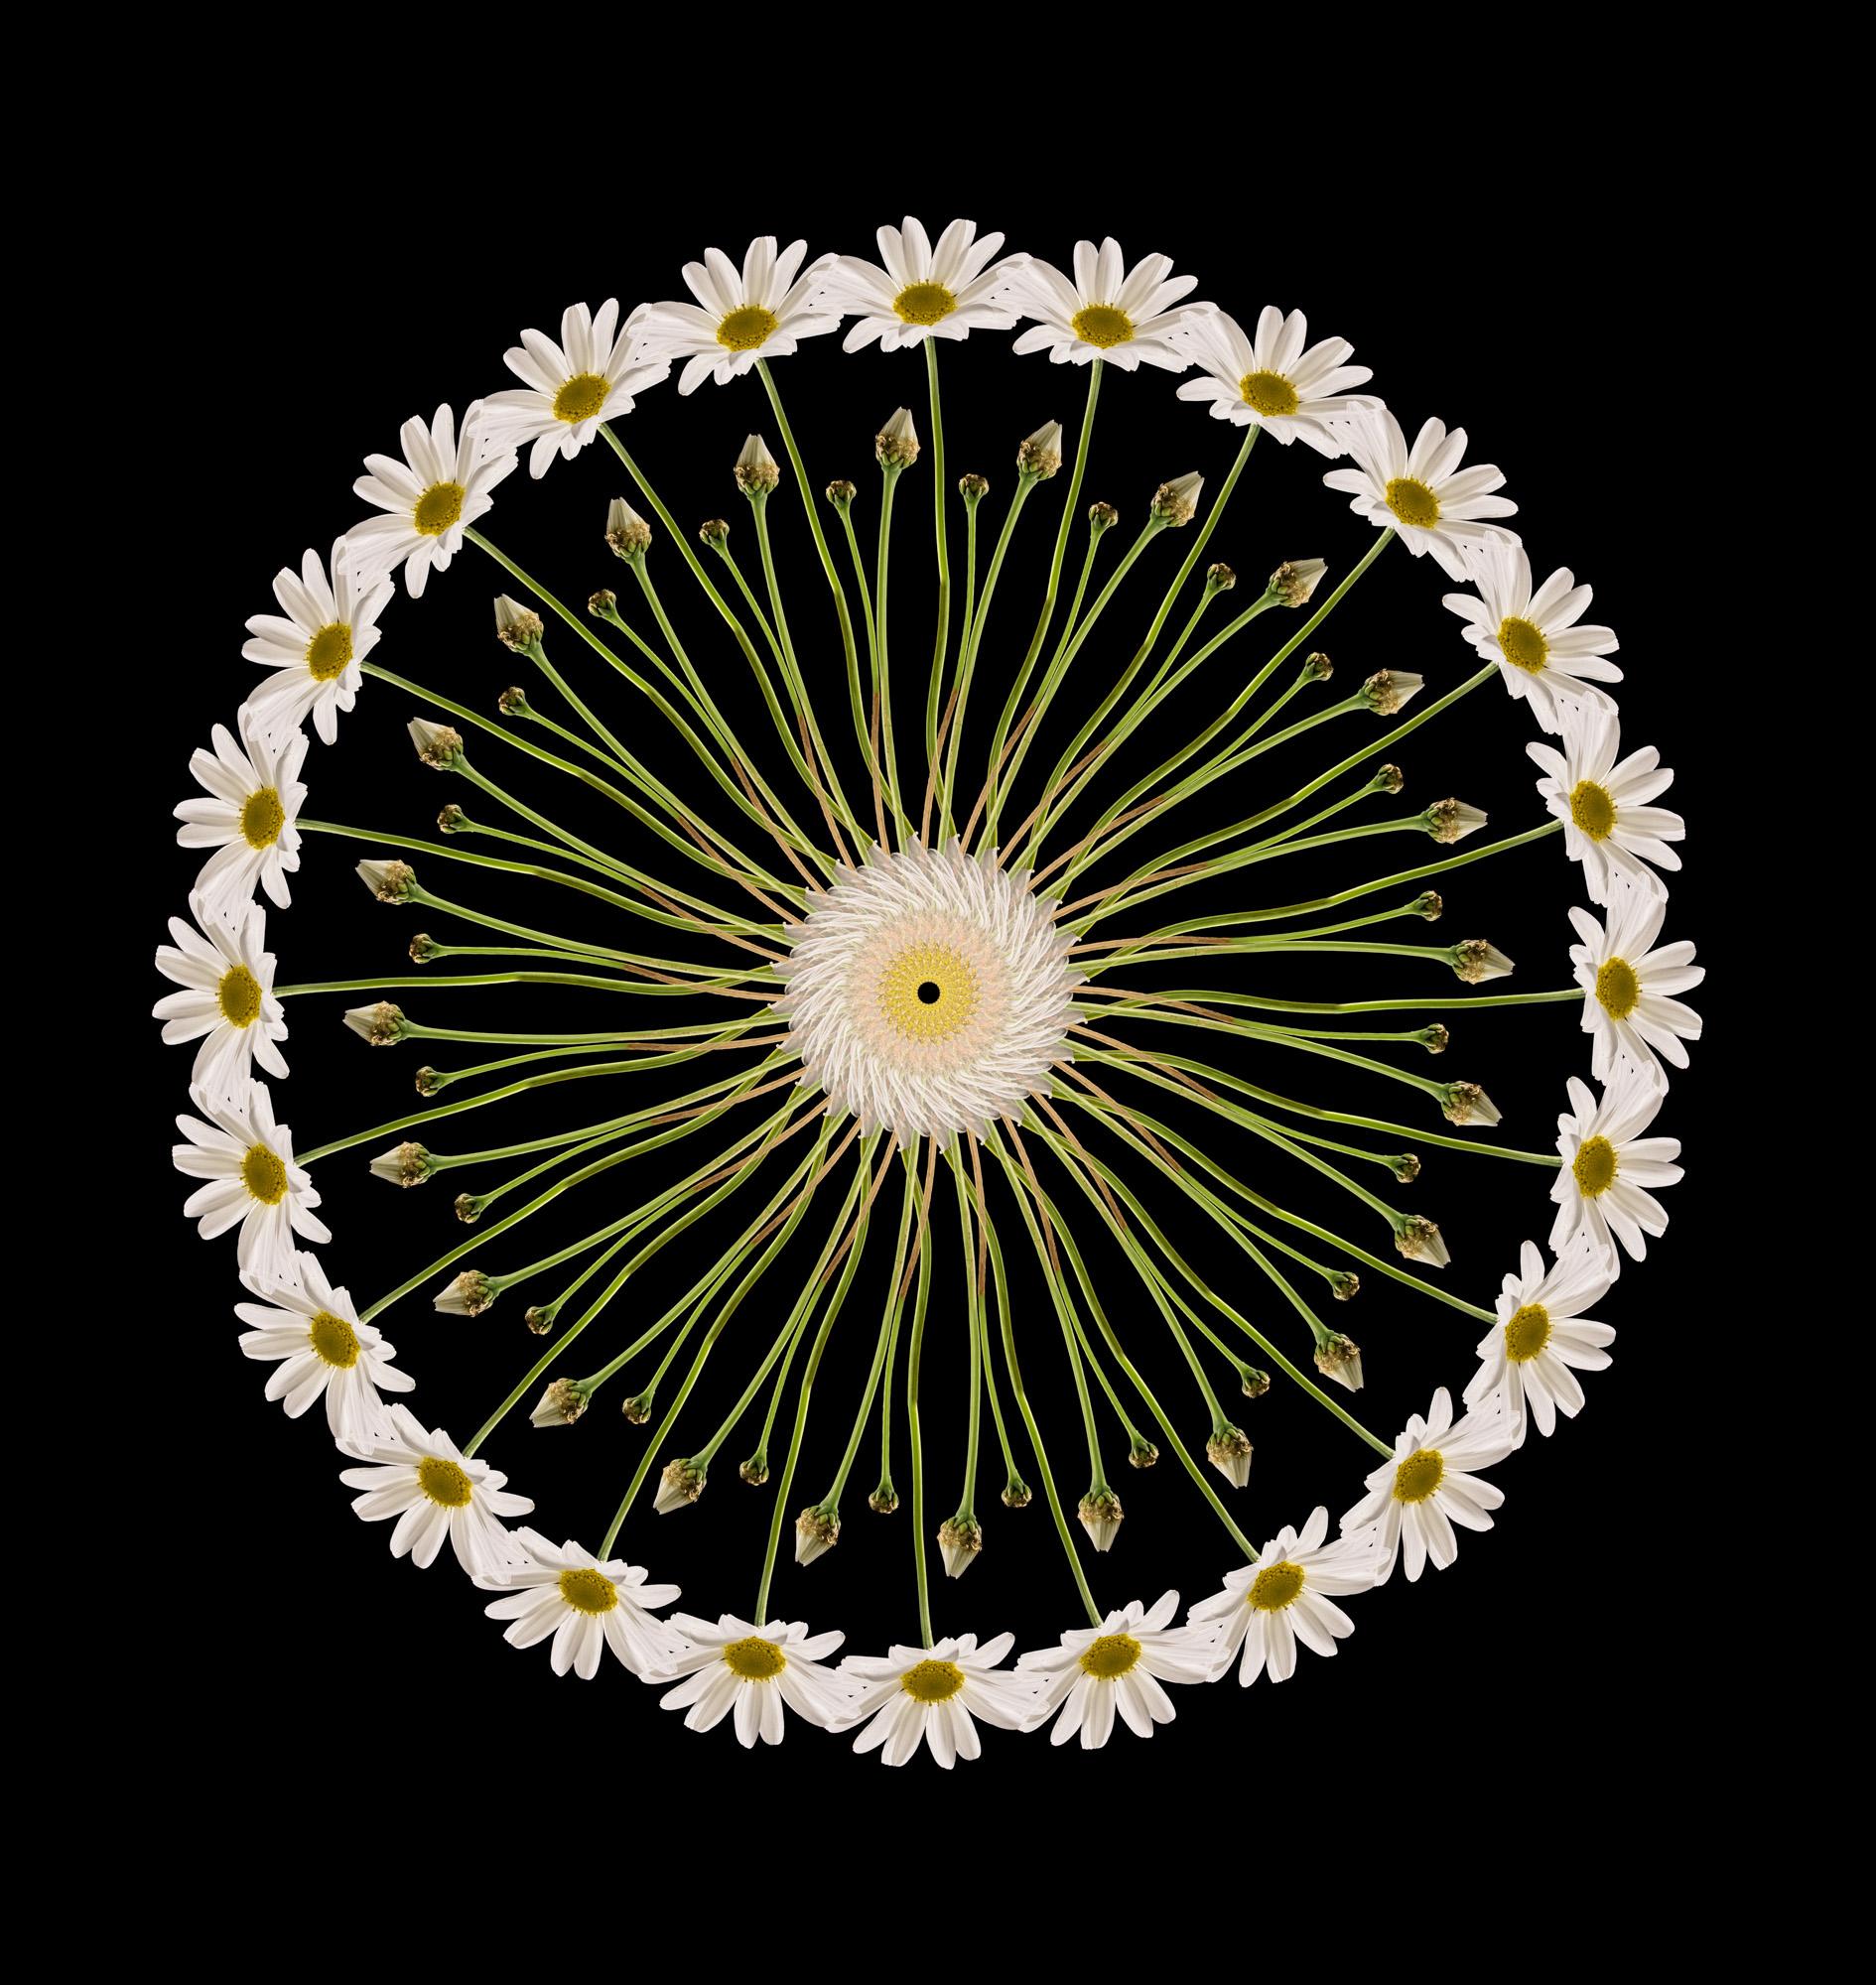 Daisy flowers abstract artwork.jpg